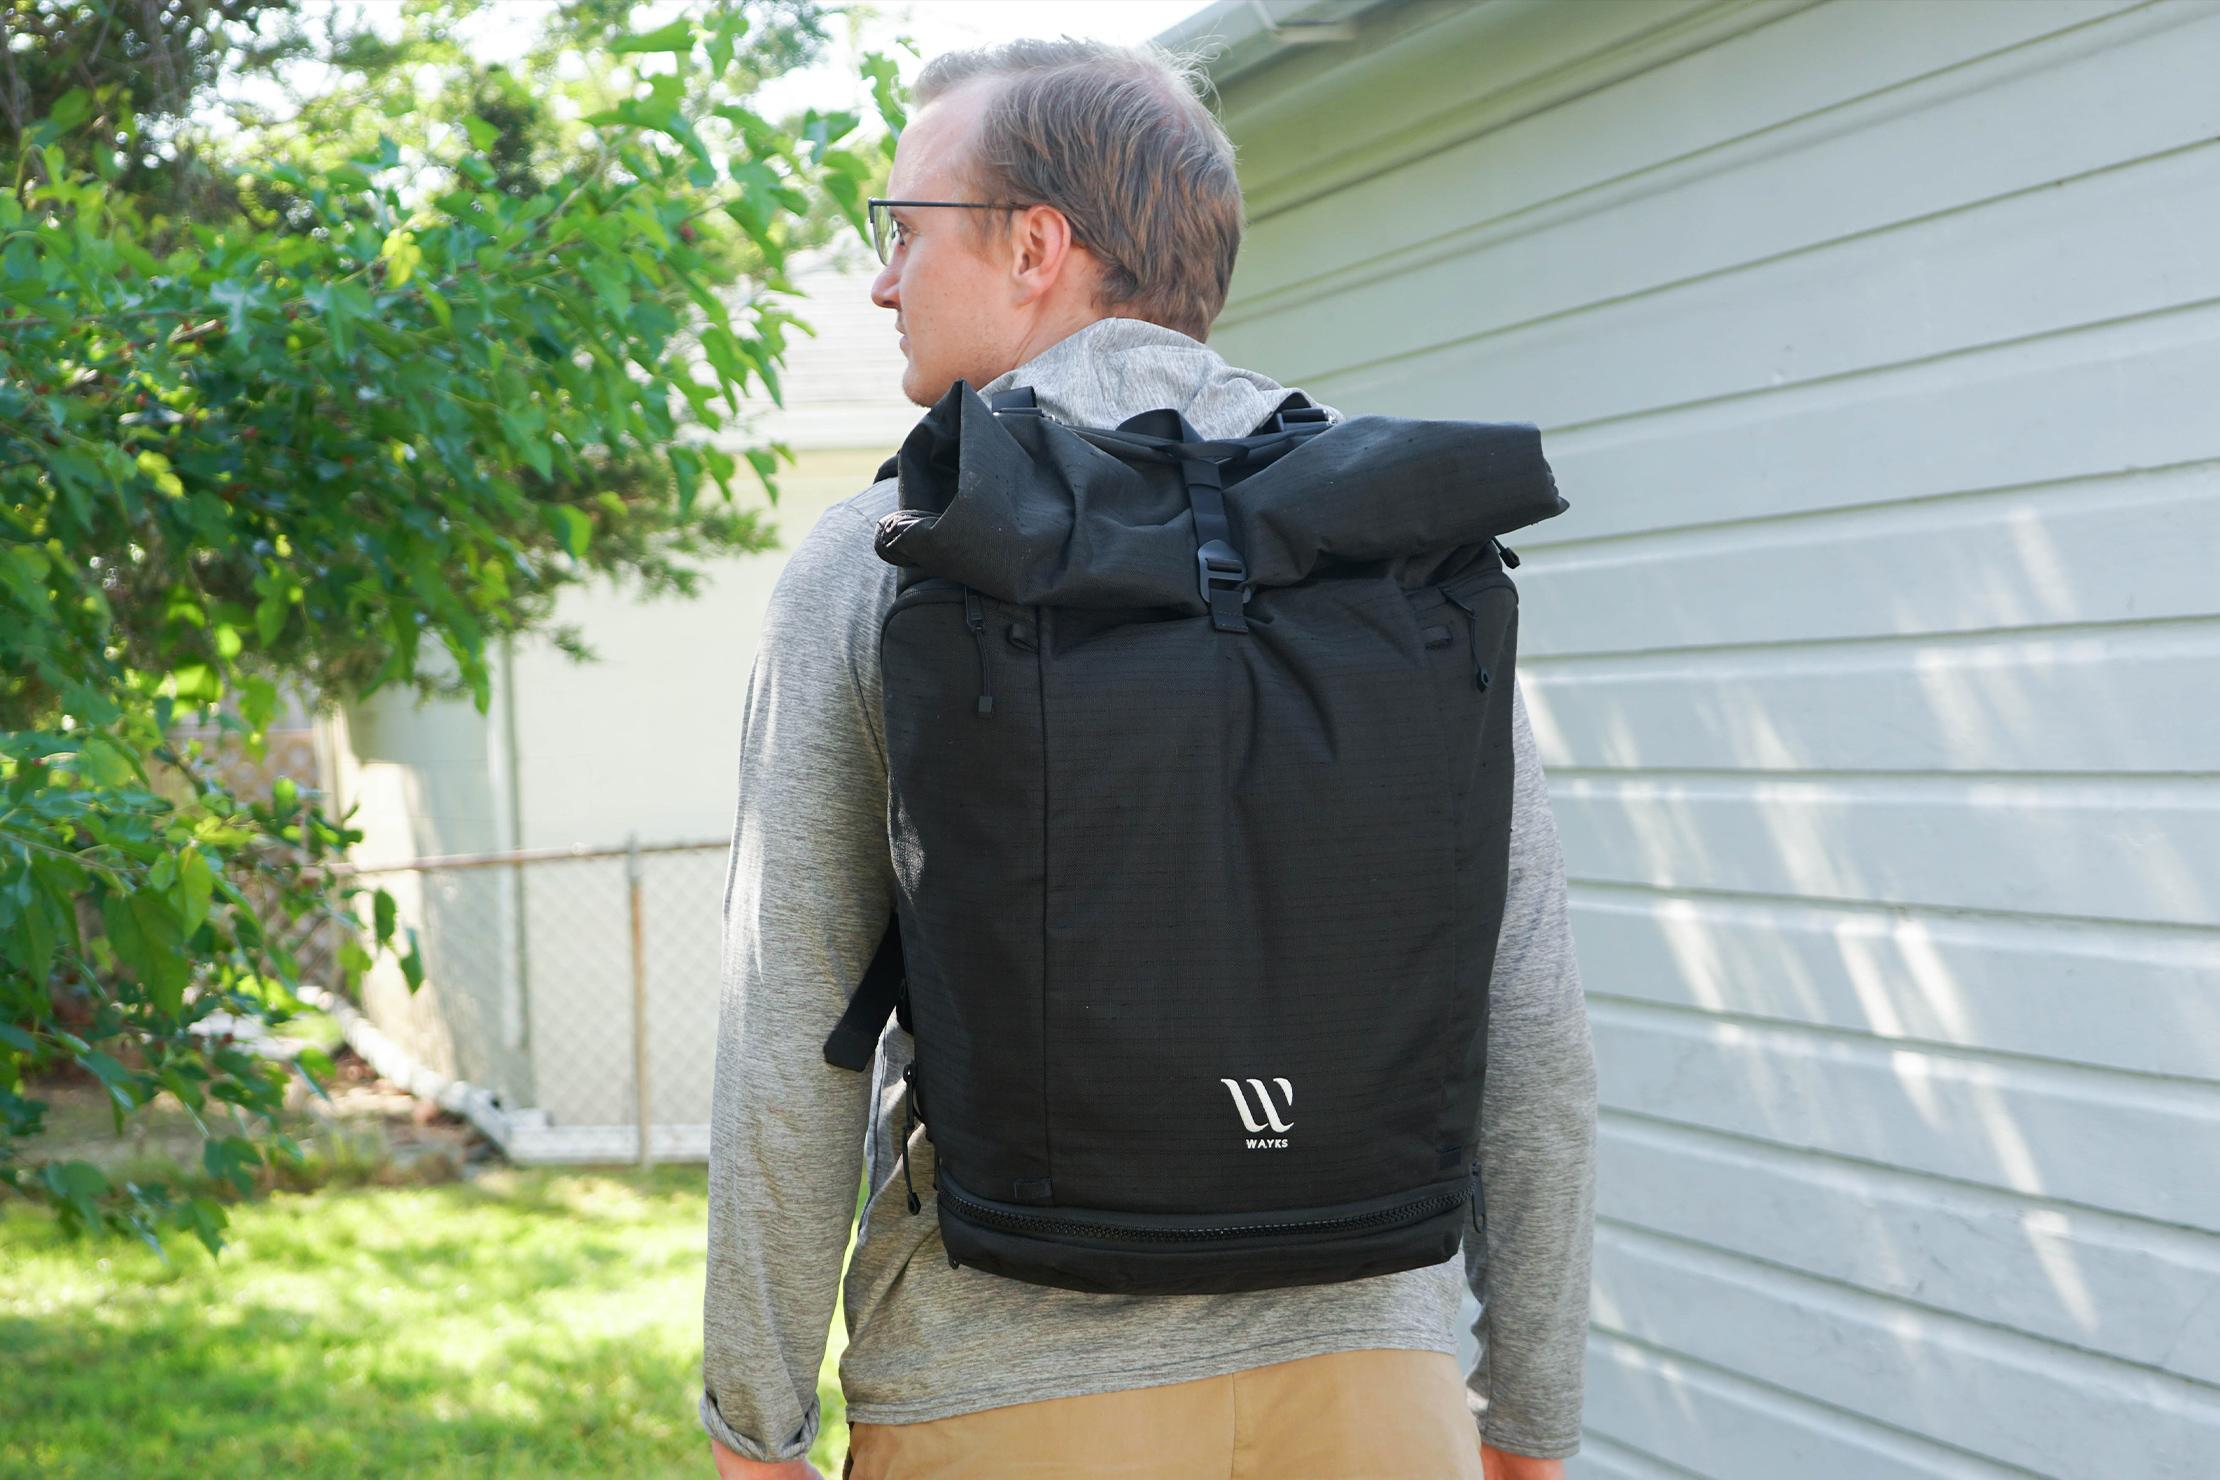 WAYKS ONE Daypack Style